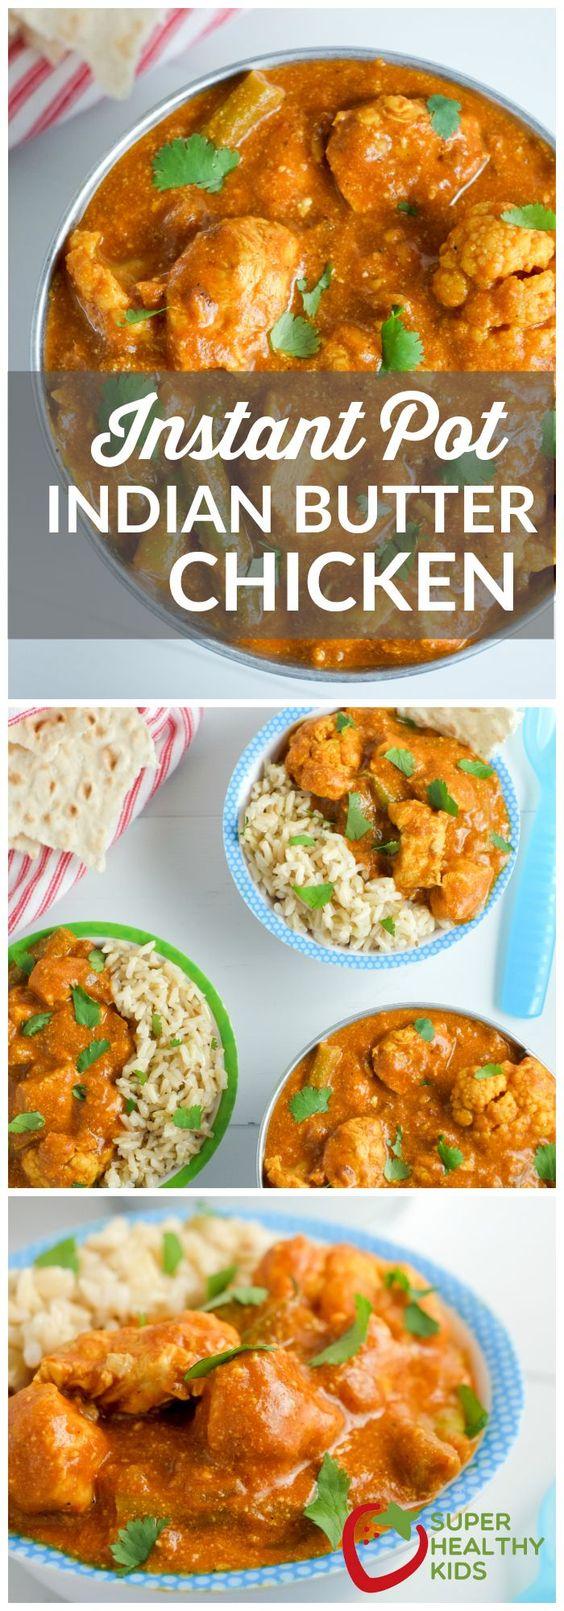 Instant Pot Indian Butter Chicken Recipe